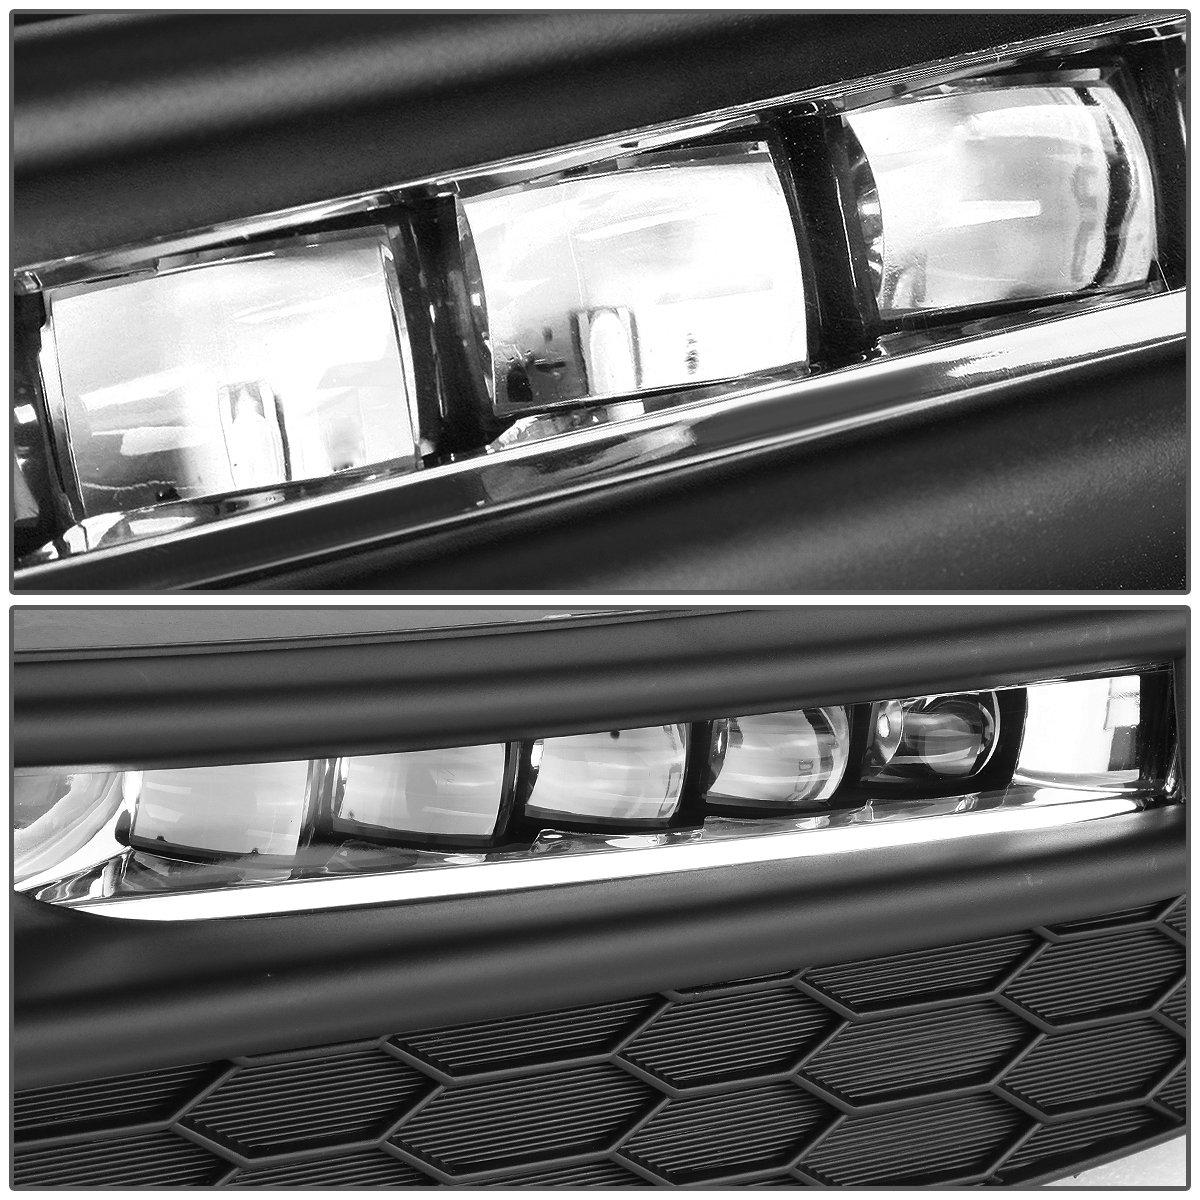 DNA Motoring FL-ZTL-257-AM Pair of Amber Lens LED Fog Light 16-17 Honda Accord Switch Bezels